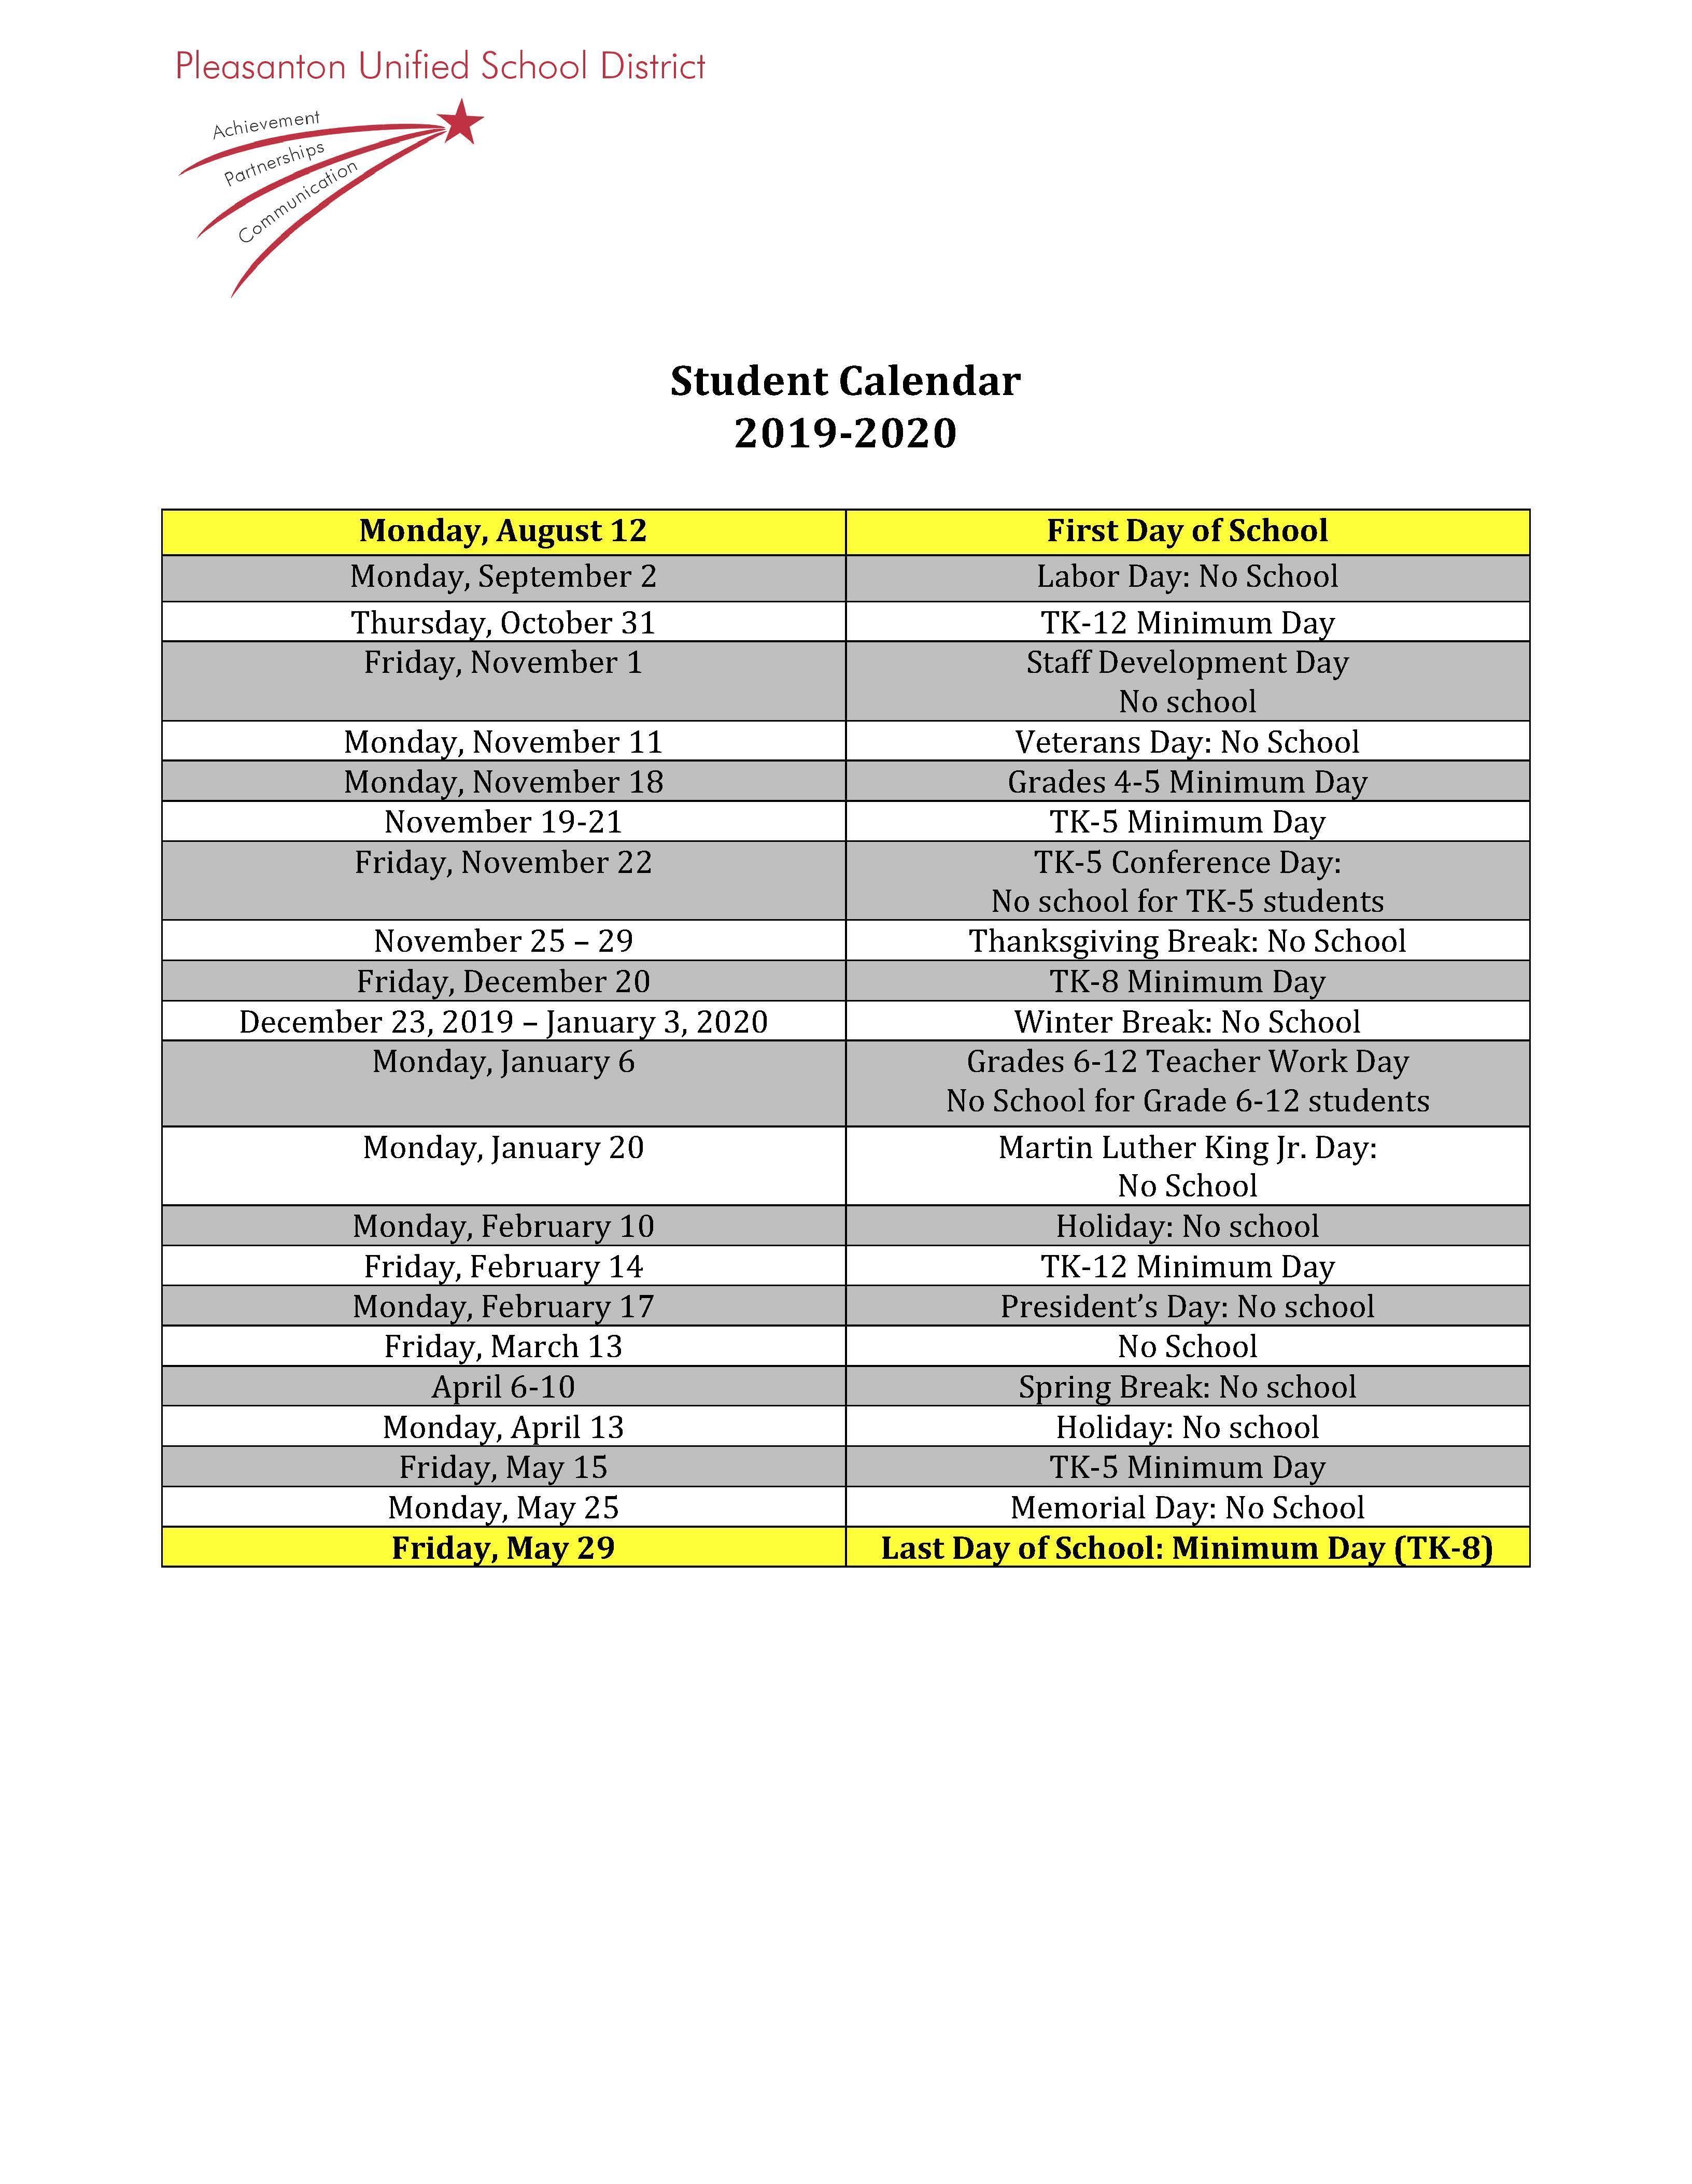 Calendars - Miscellaneous - Pleasanton Unified School District Inside Livermore School District Calander